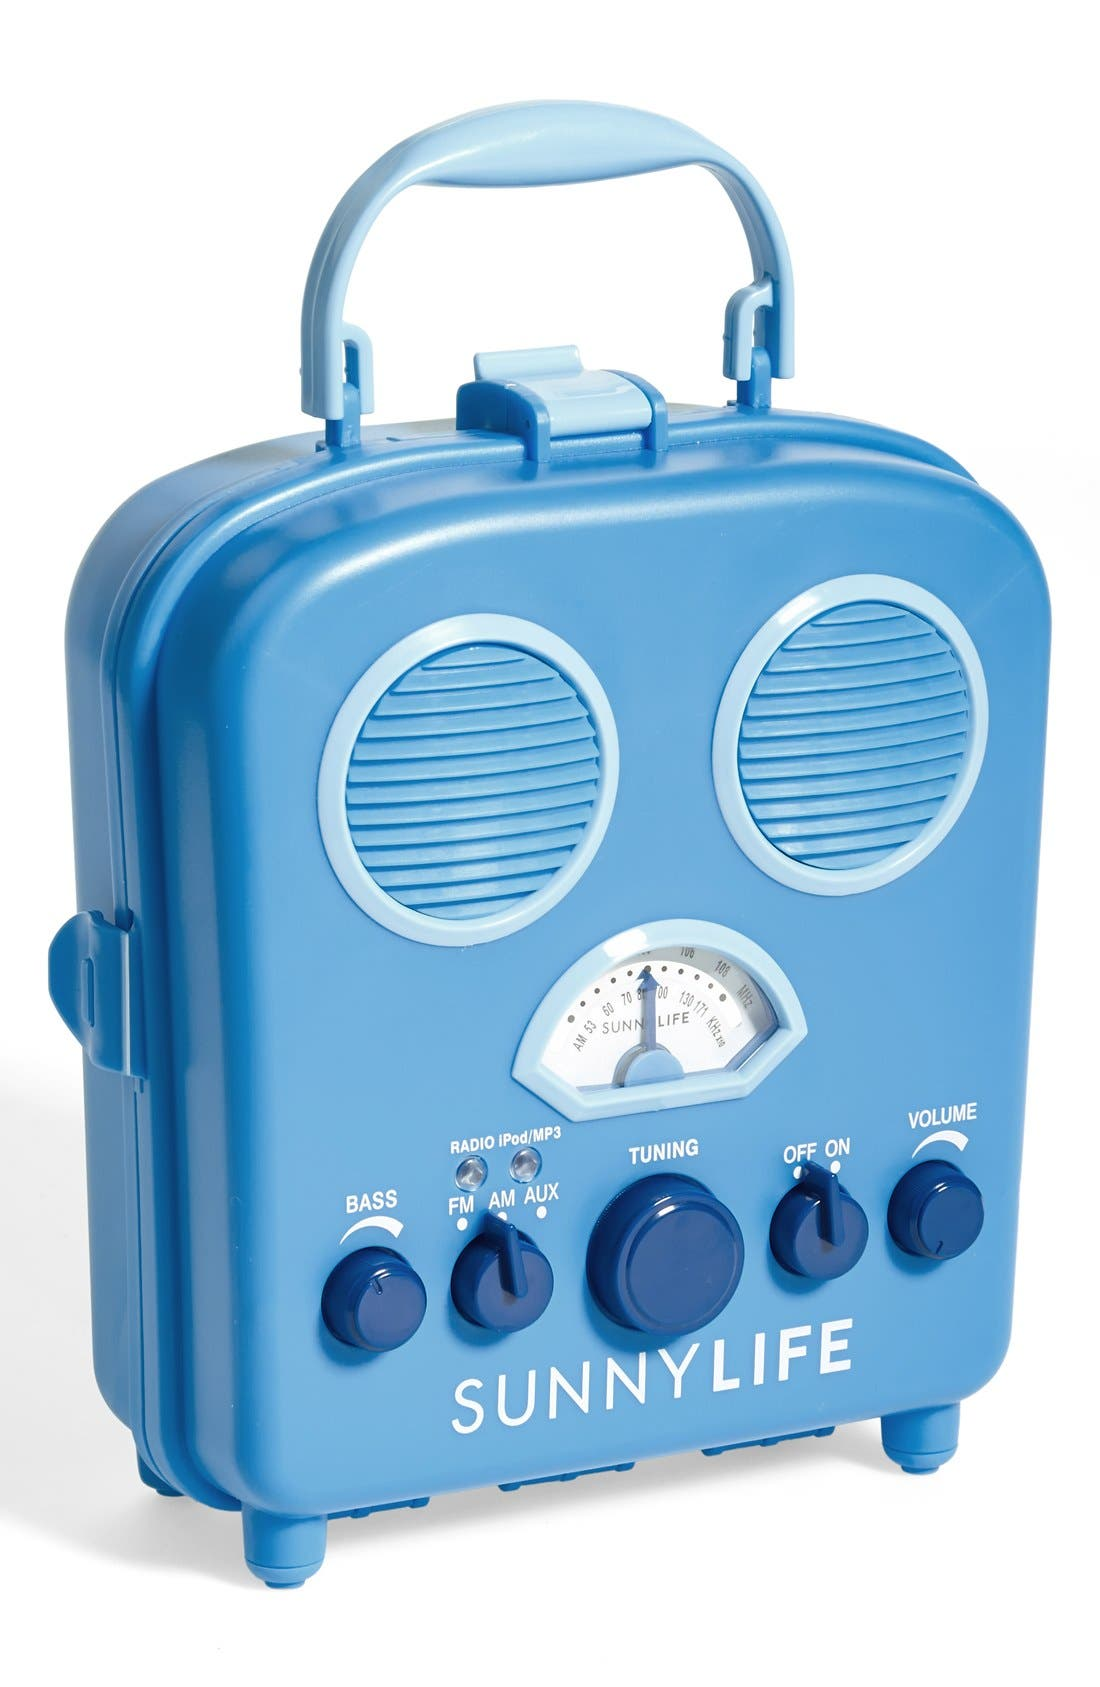 Alternate Image 1 Selected - Sunnylife 'Beach Sounds' Portable Water Resistant Speaker & Radio